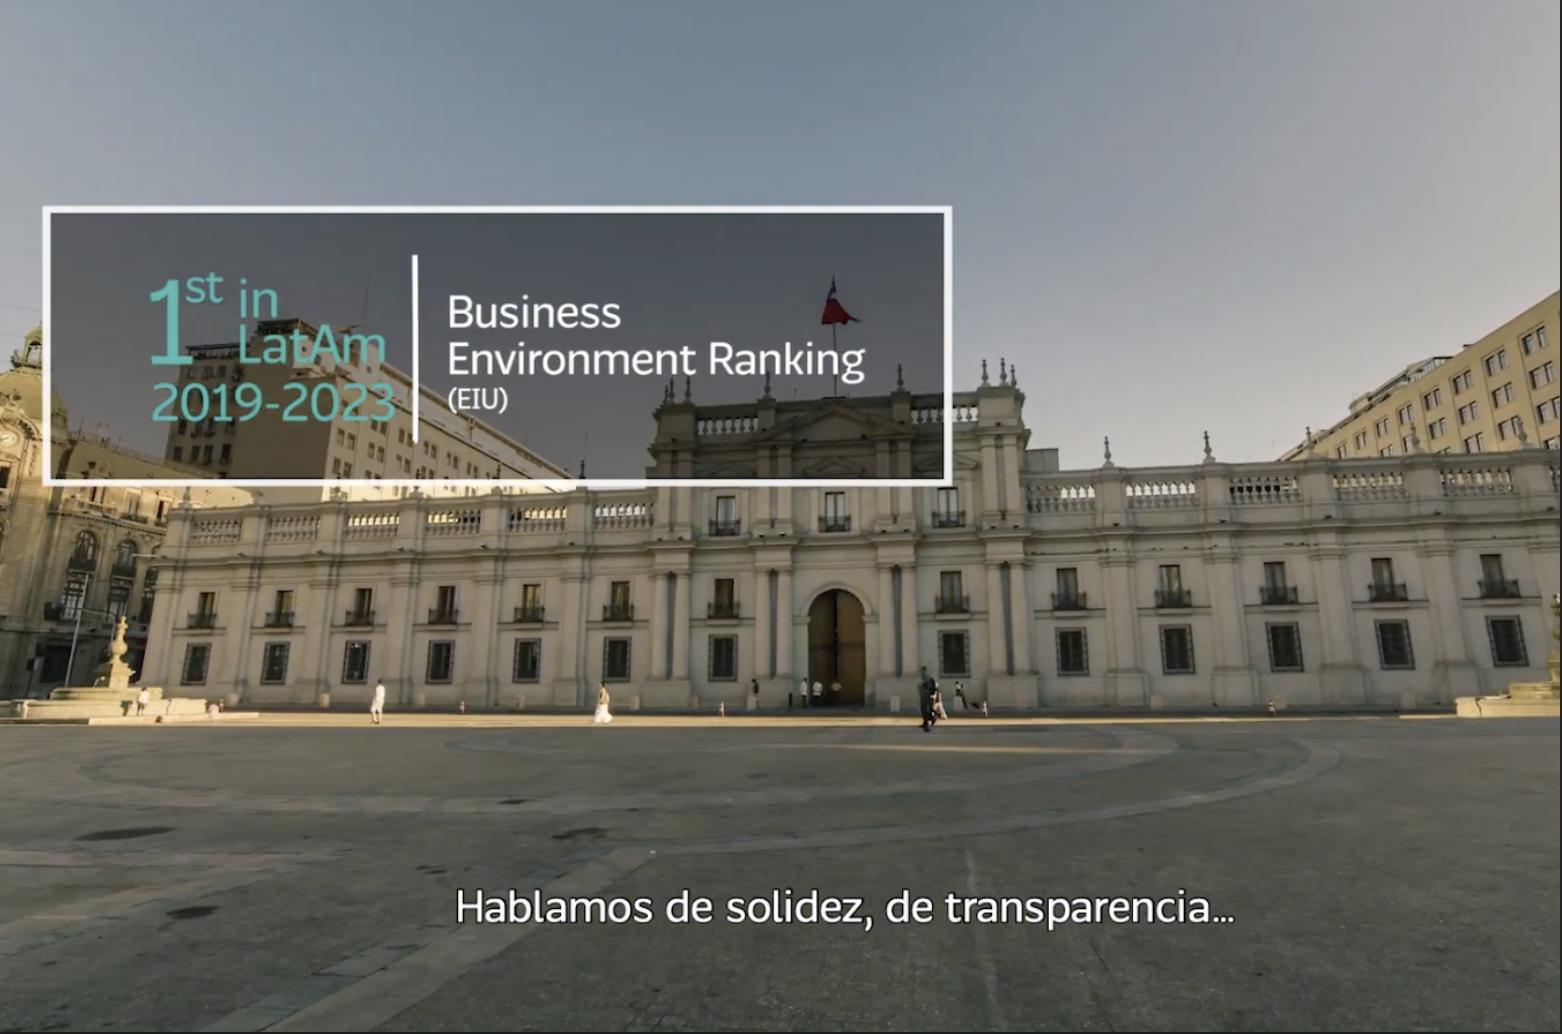 Chile rankeado nº1 en potencial para inversión extranjera de Latinoamérica | Marca Chile